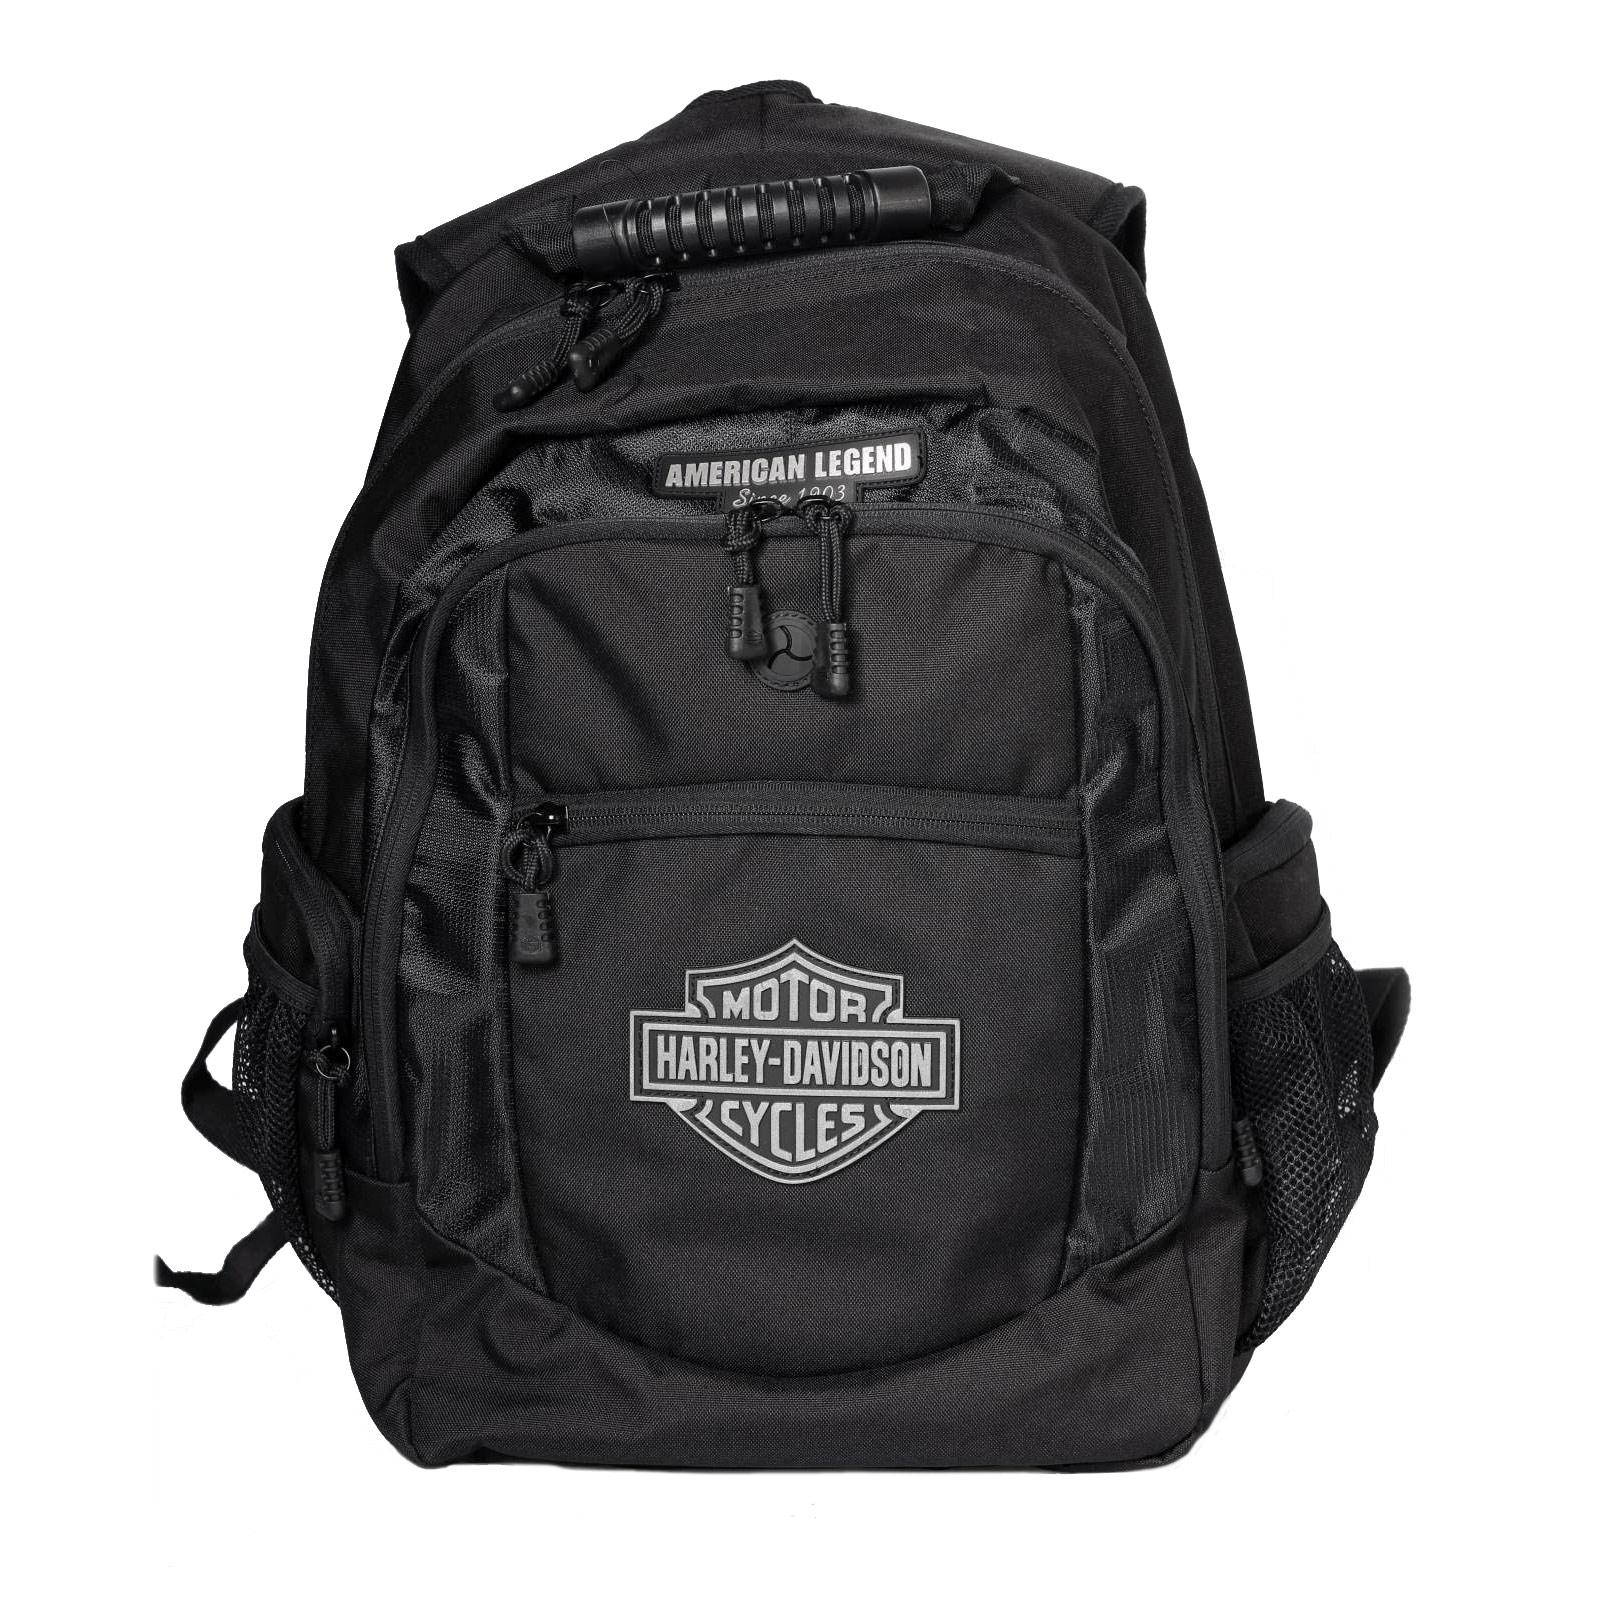 harley davidson classic backpack at thunderbike shop